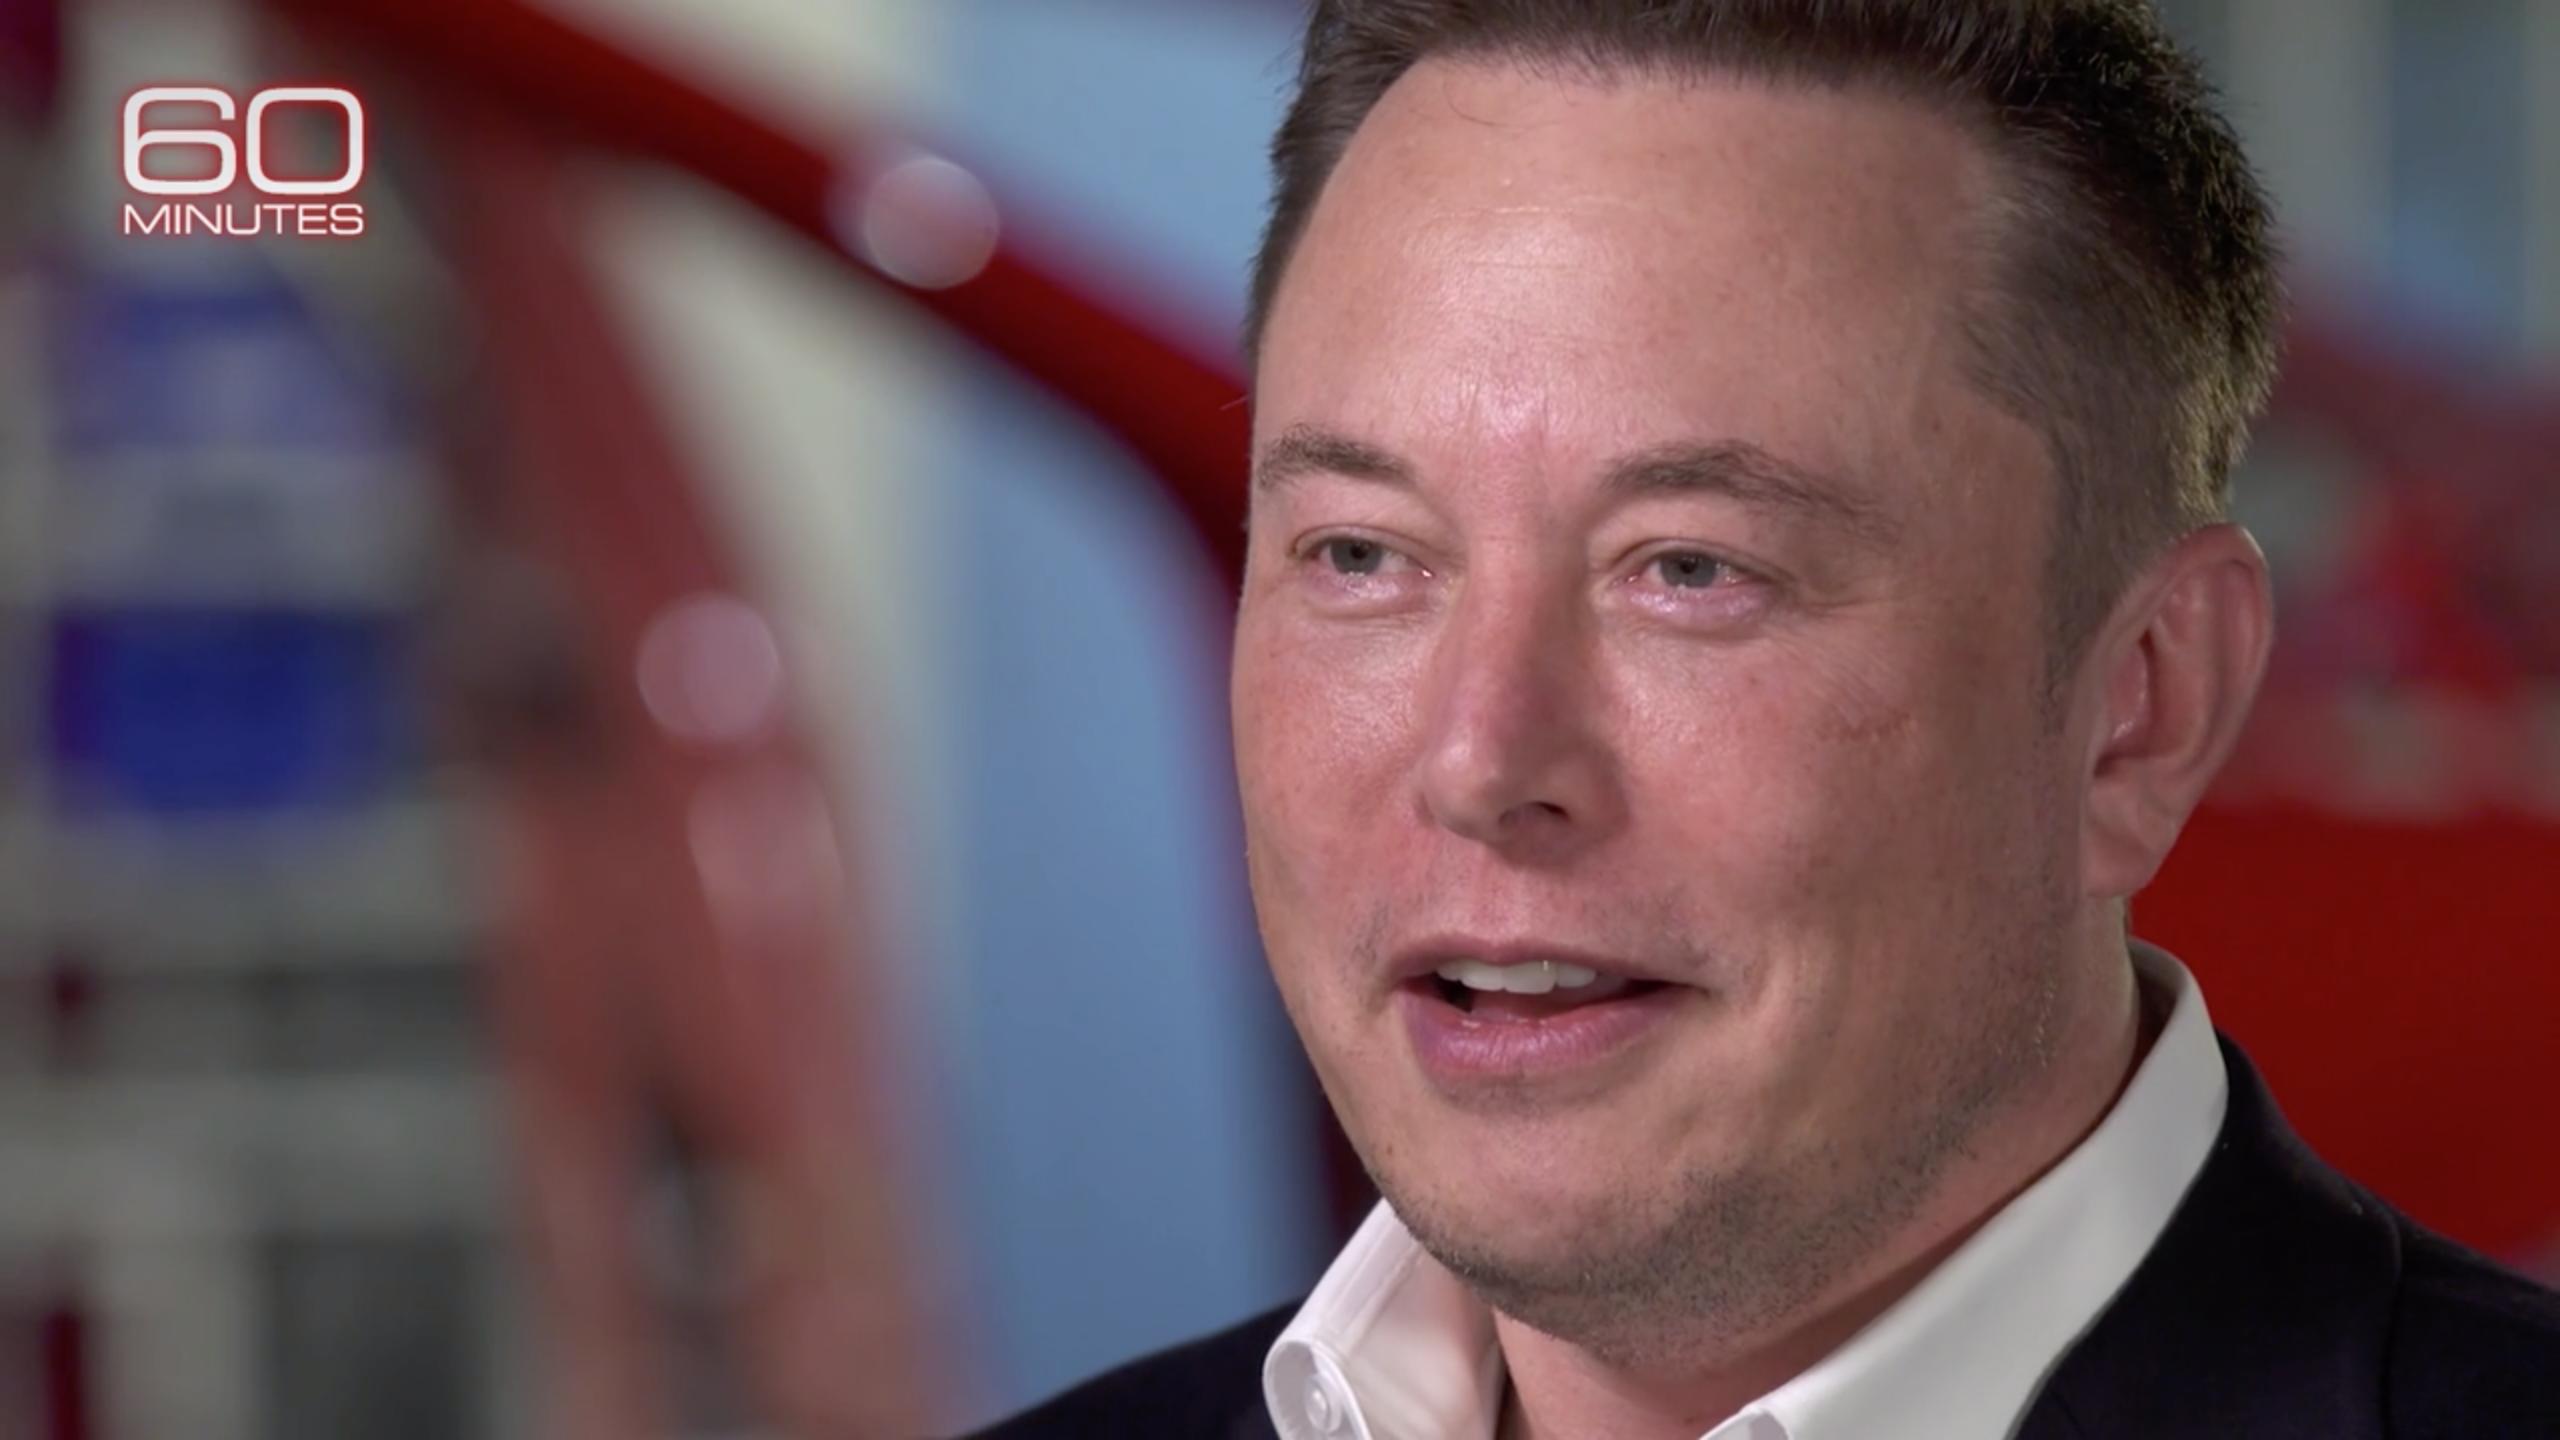 Elon Musk On 60 Minutes I Do Not Respect The SEC